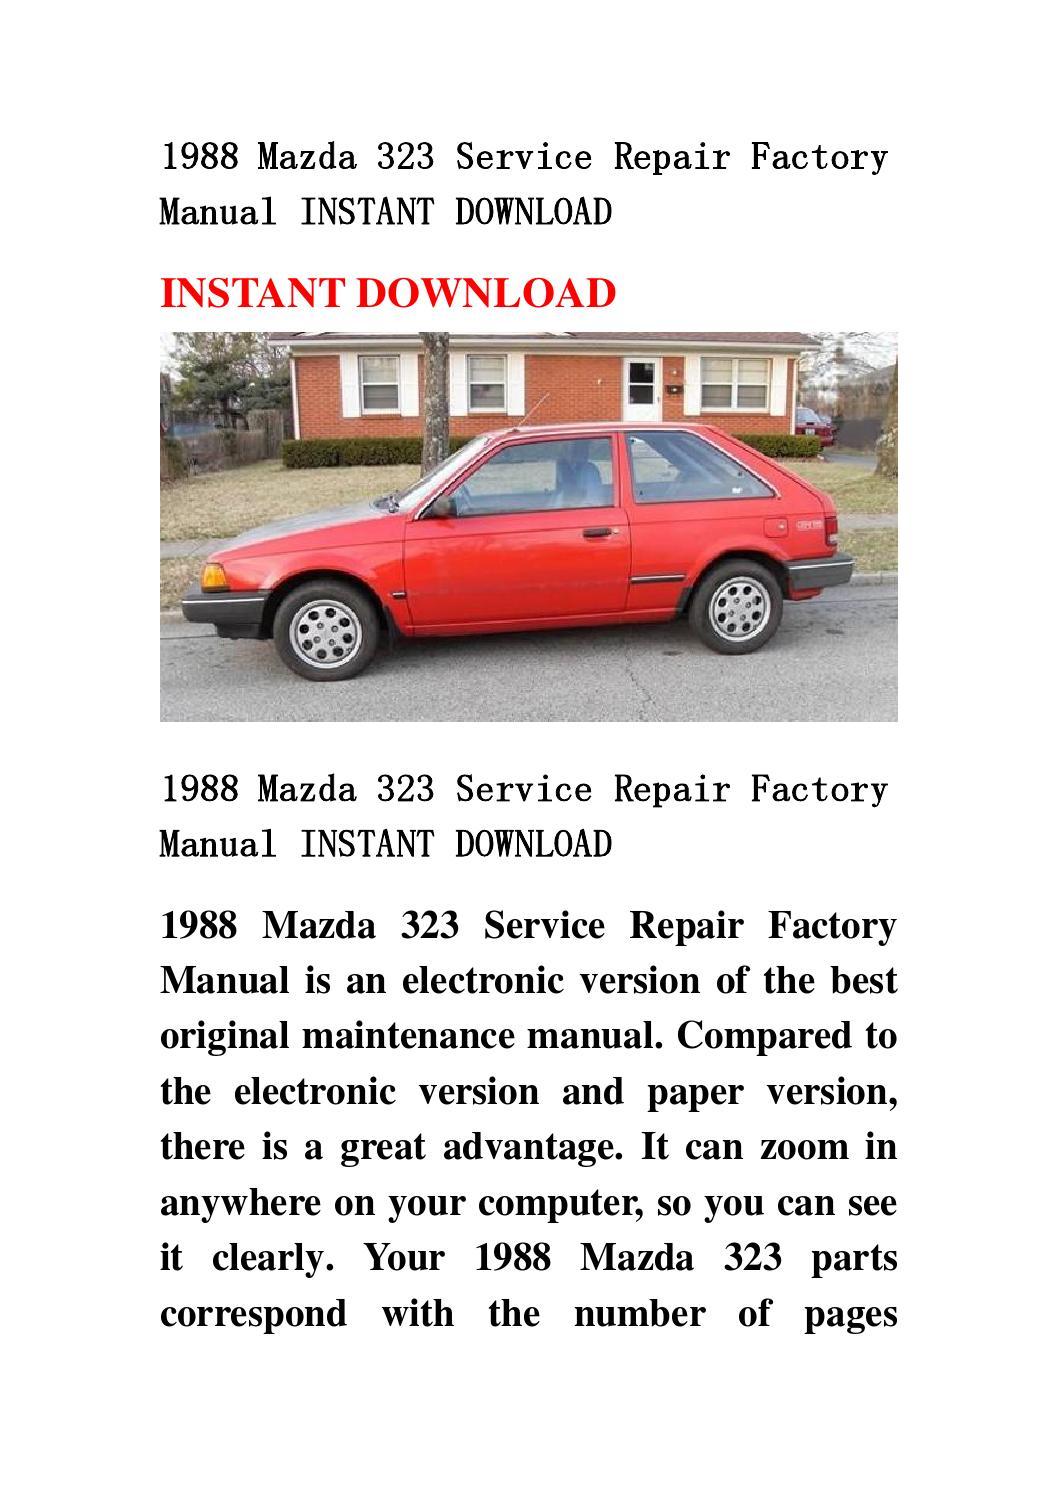 mazda 3 service manual download